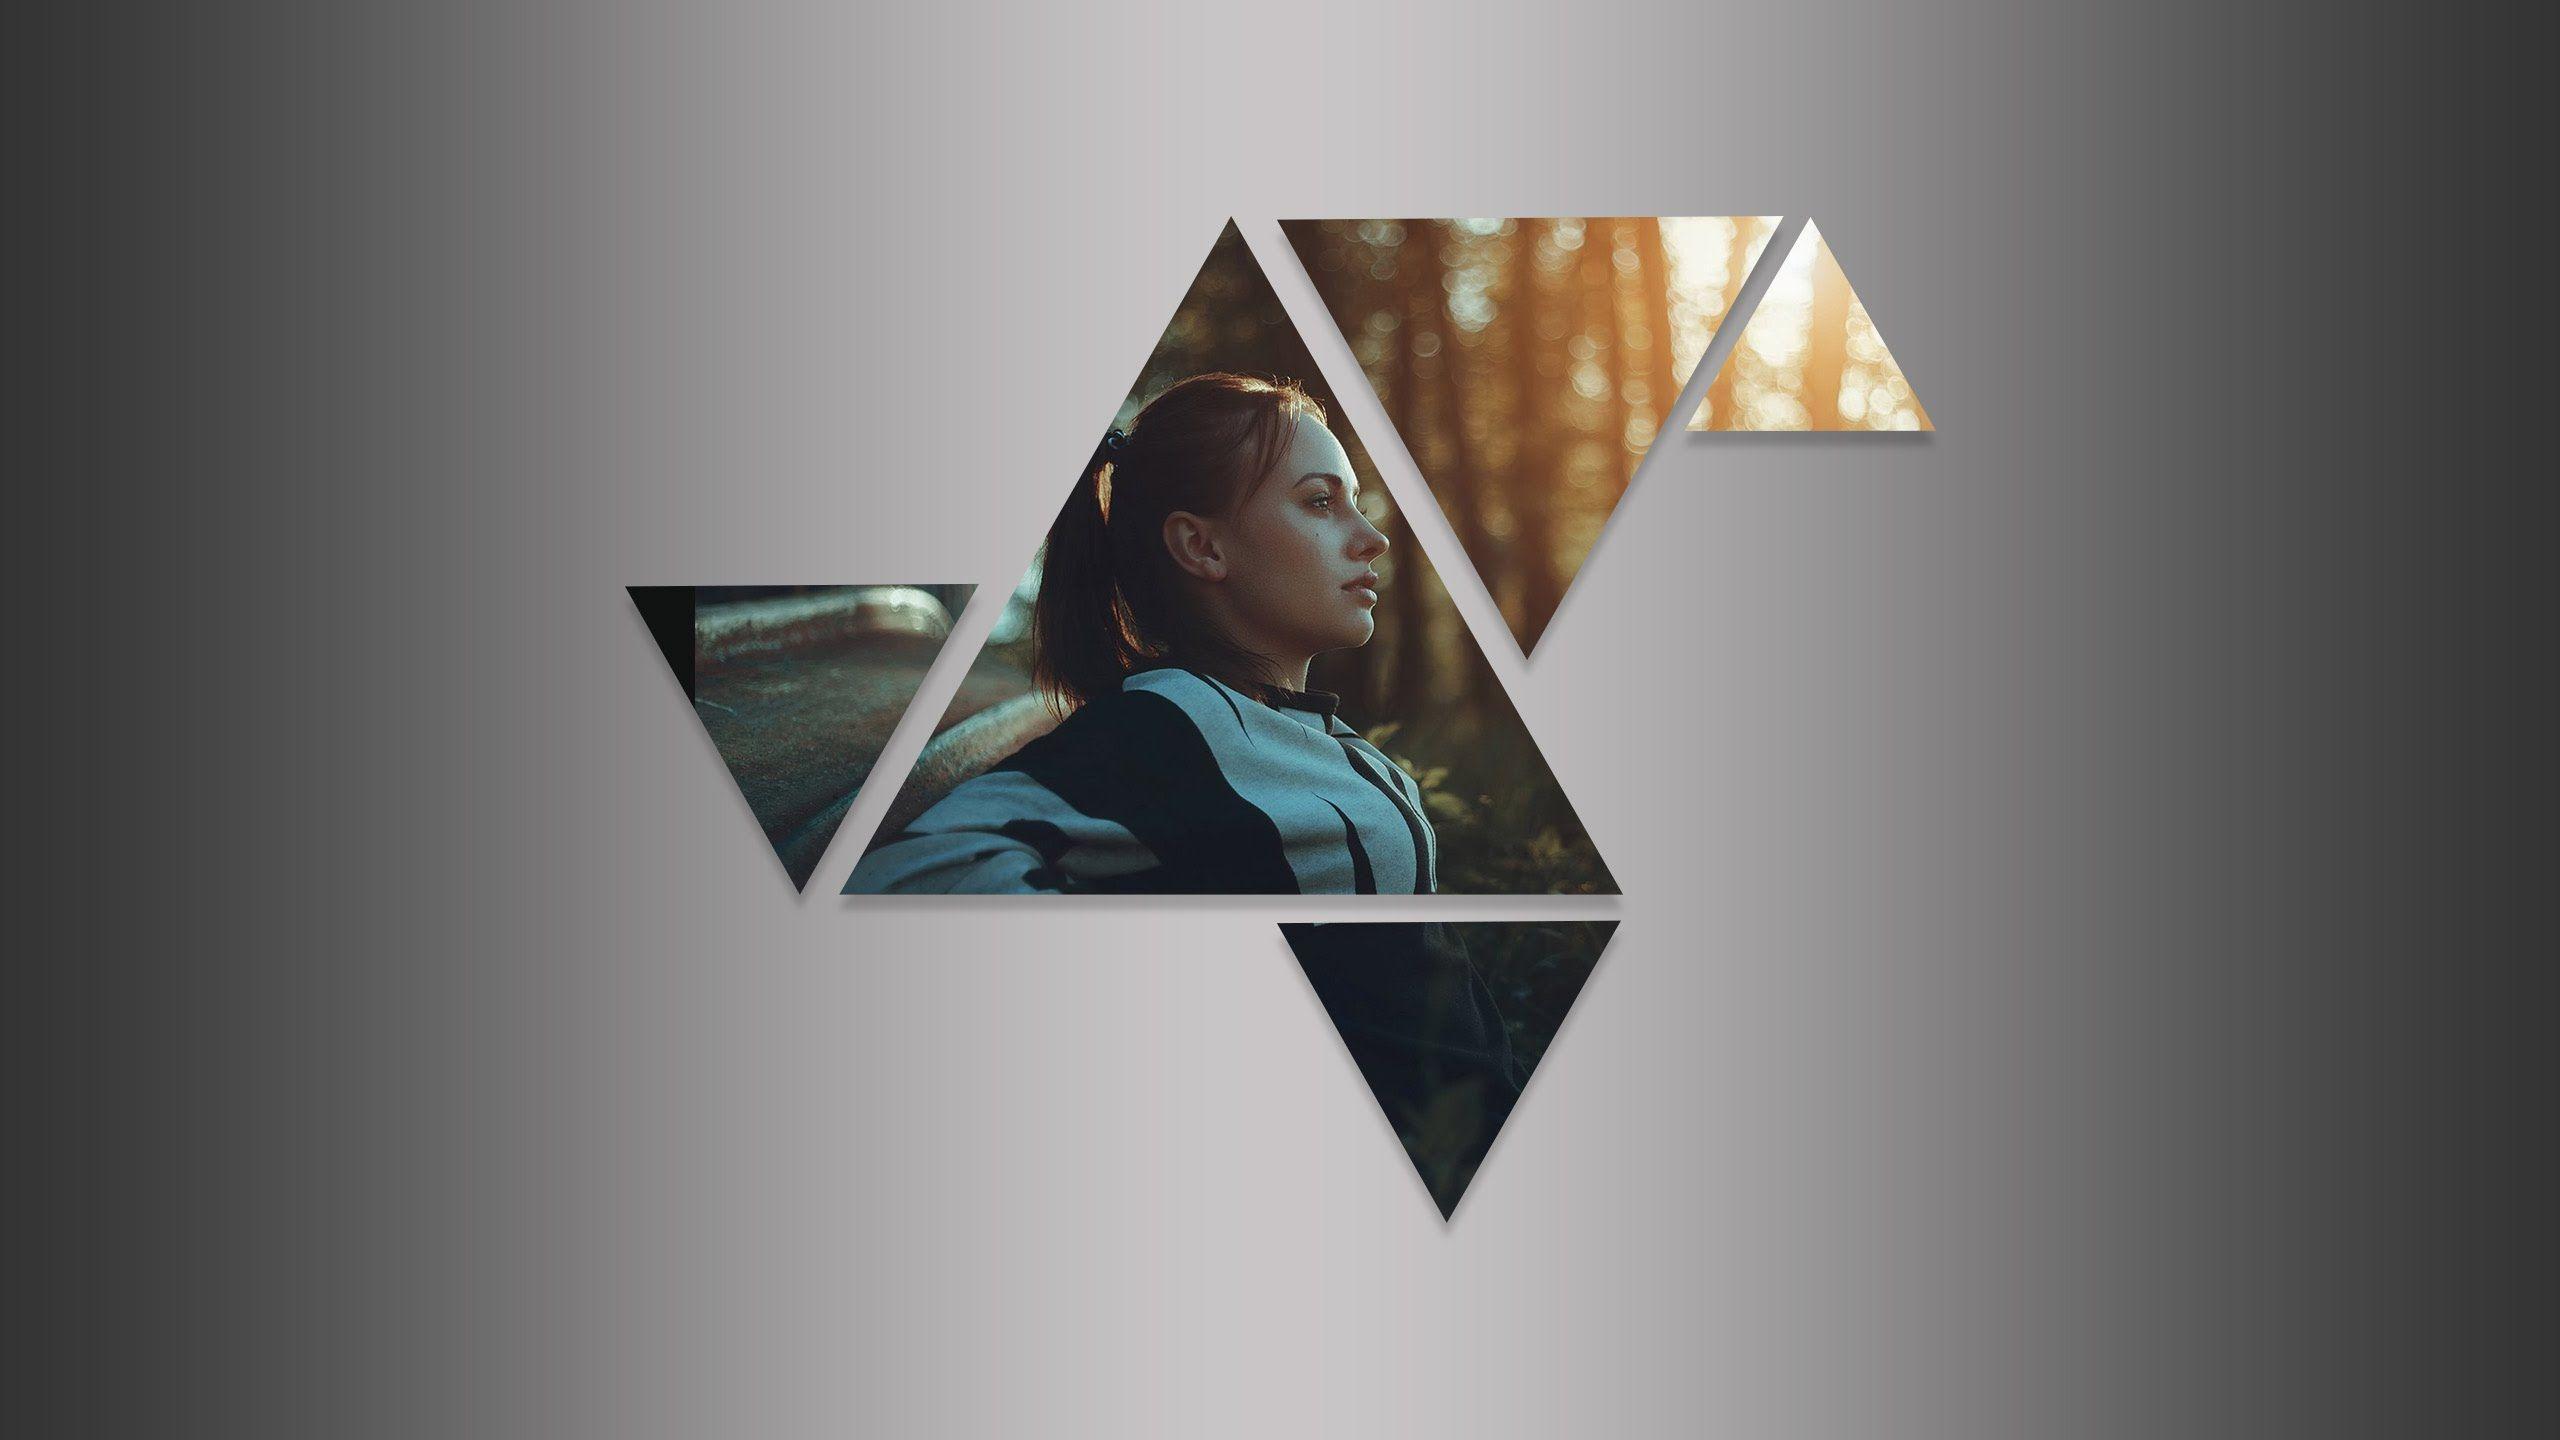 triangle pattern photoshop tutorial